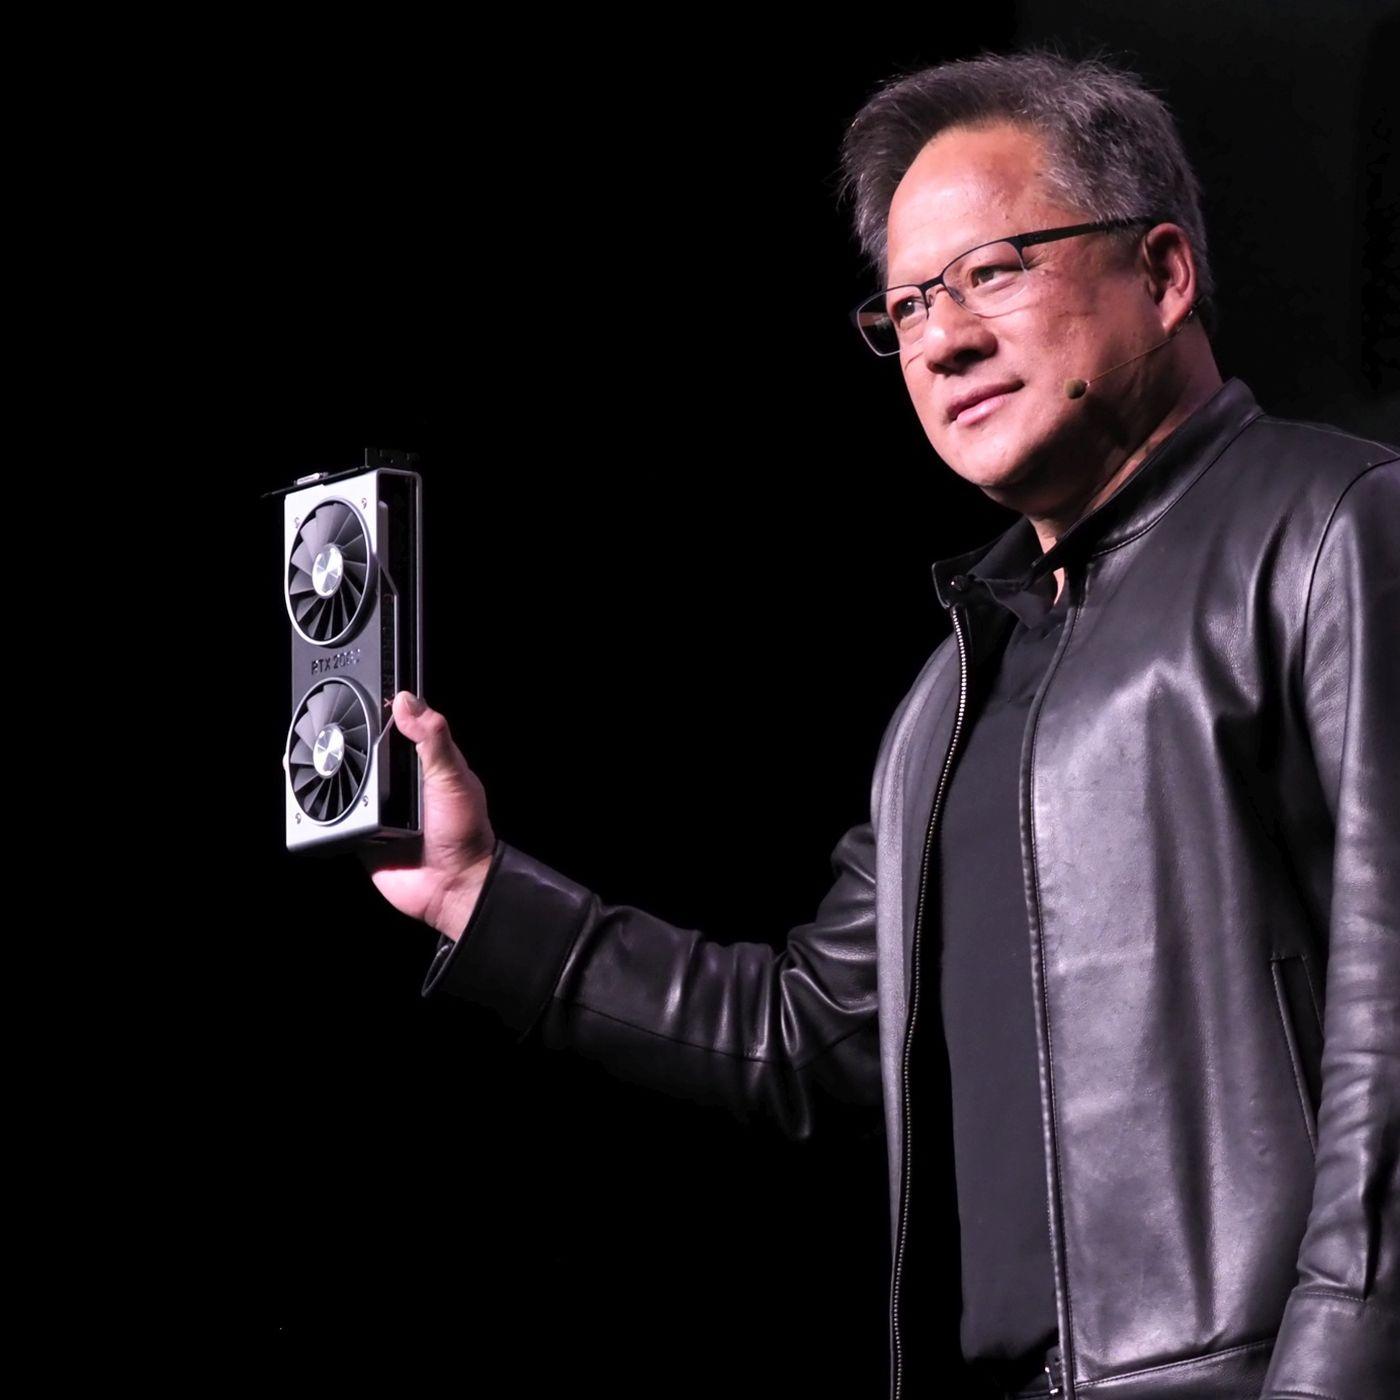 Nvidia S Ceo Thinks Amd S New Gpu Has Lousy Performance The Verge